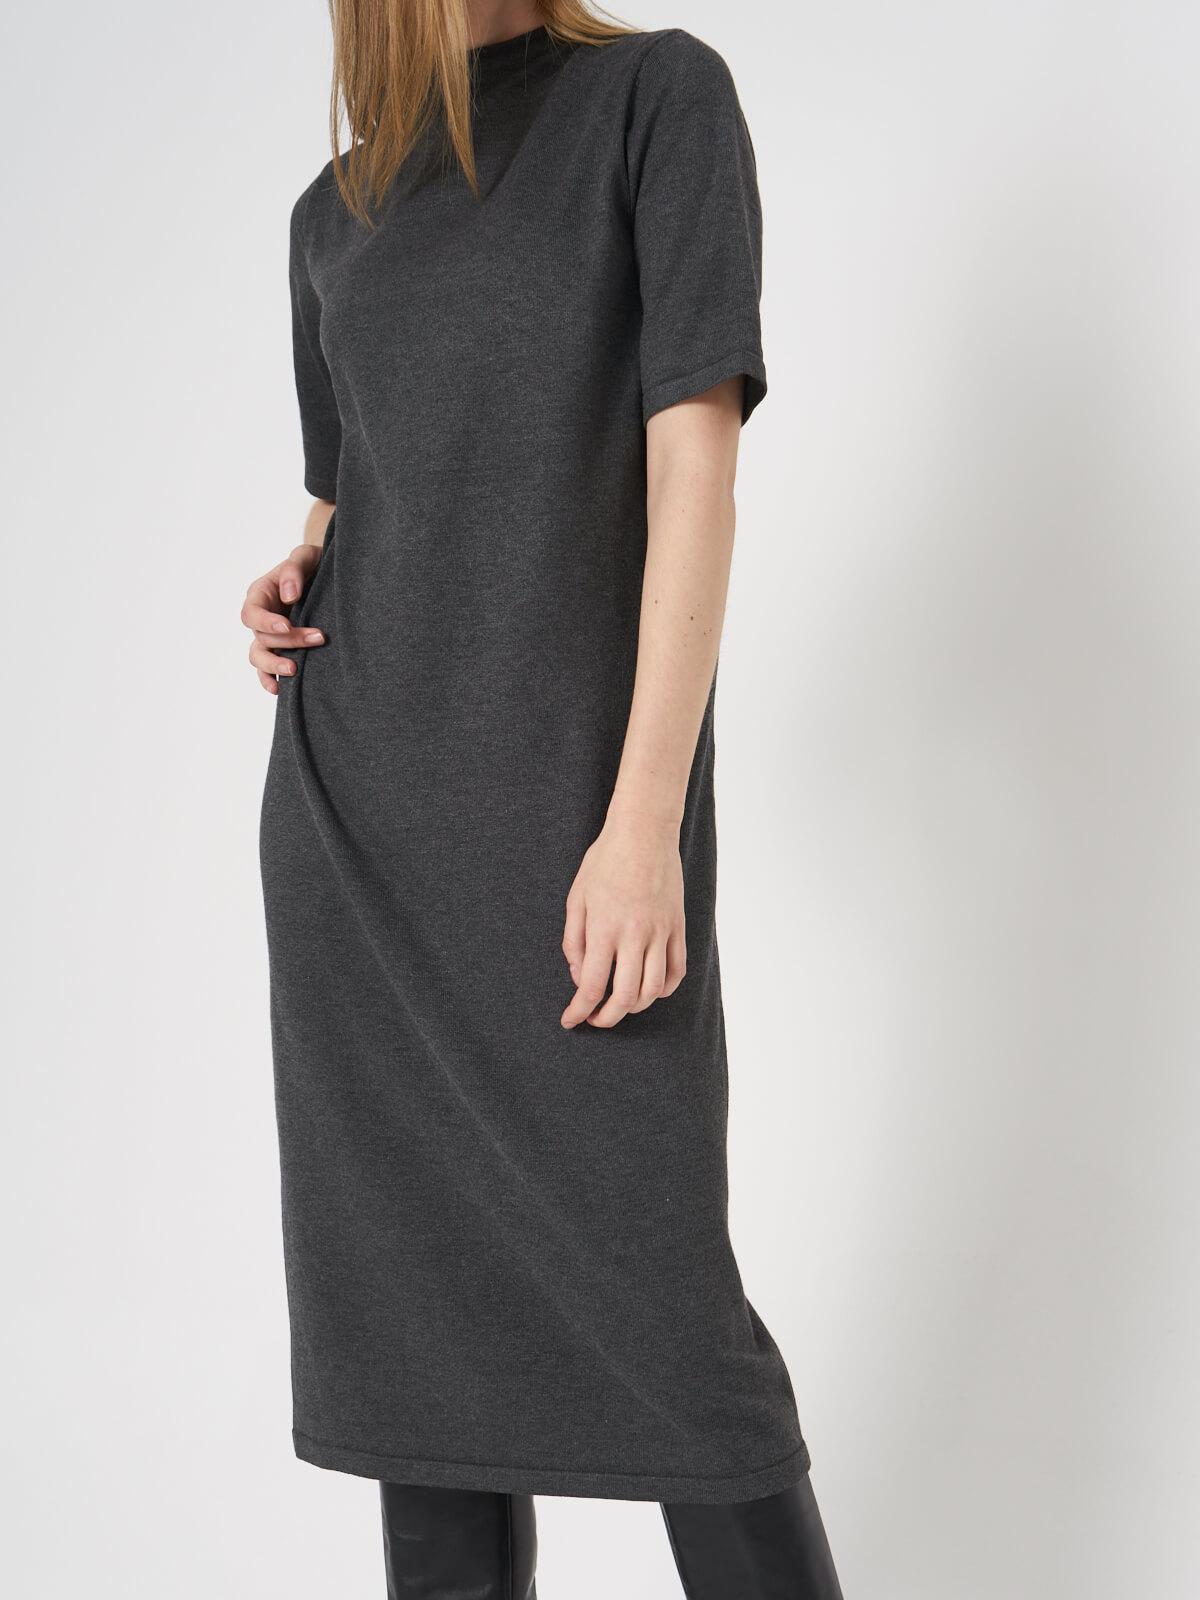 Платье трикотажное с коротким рукавом